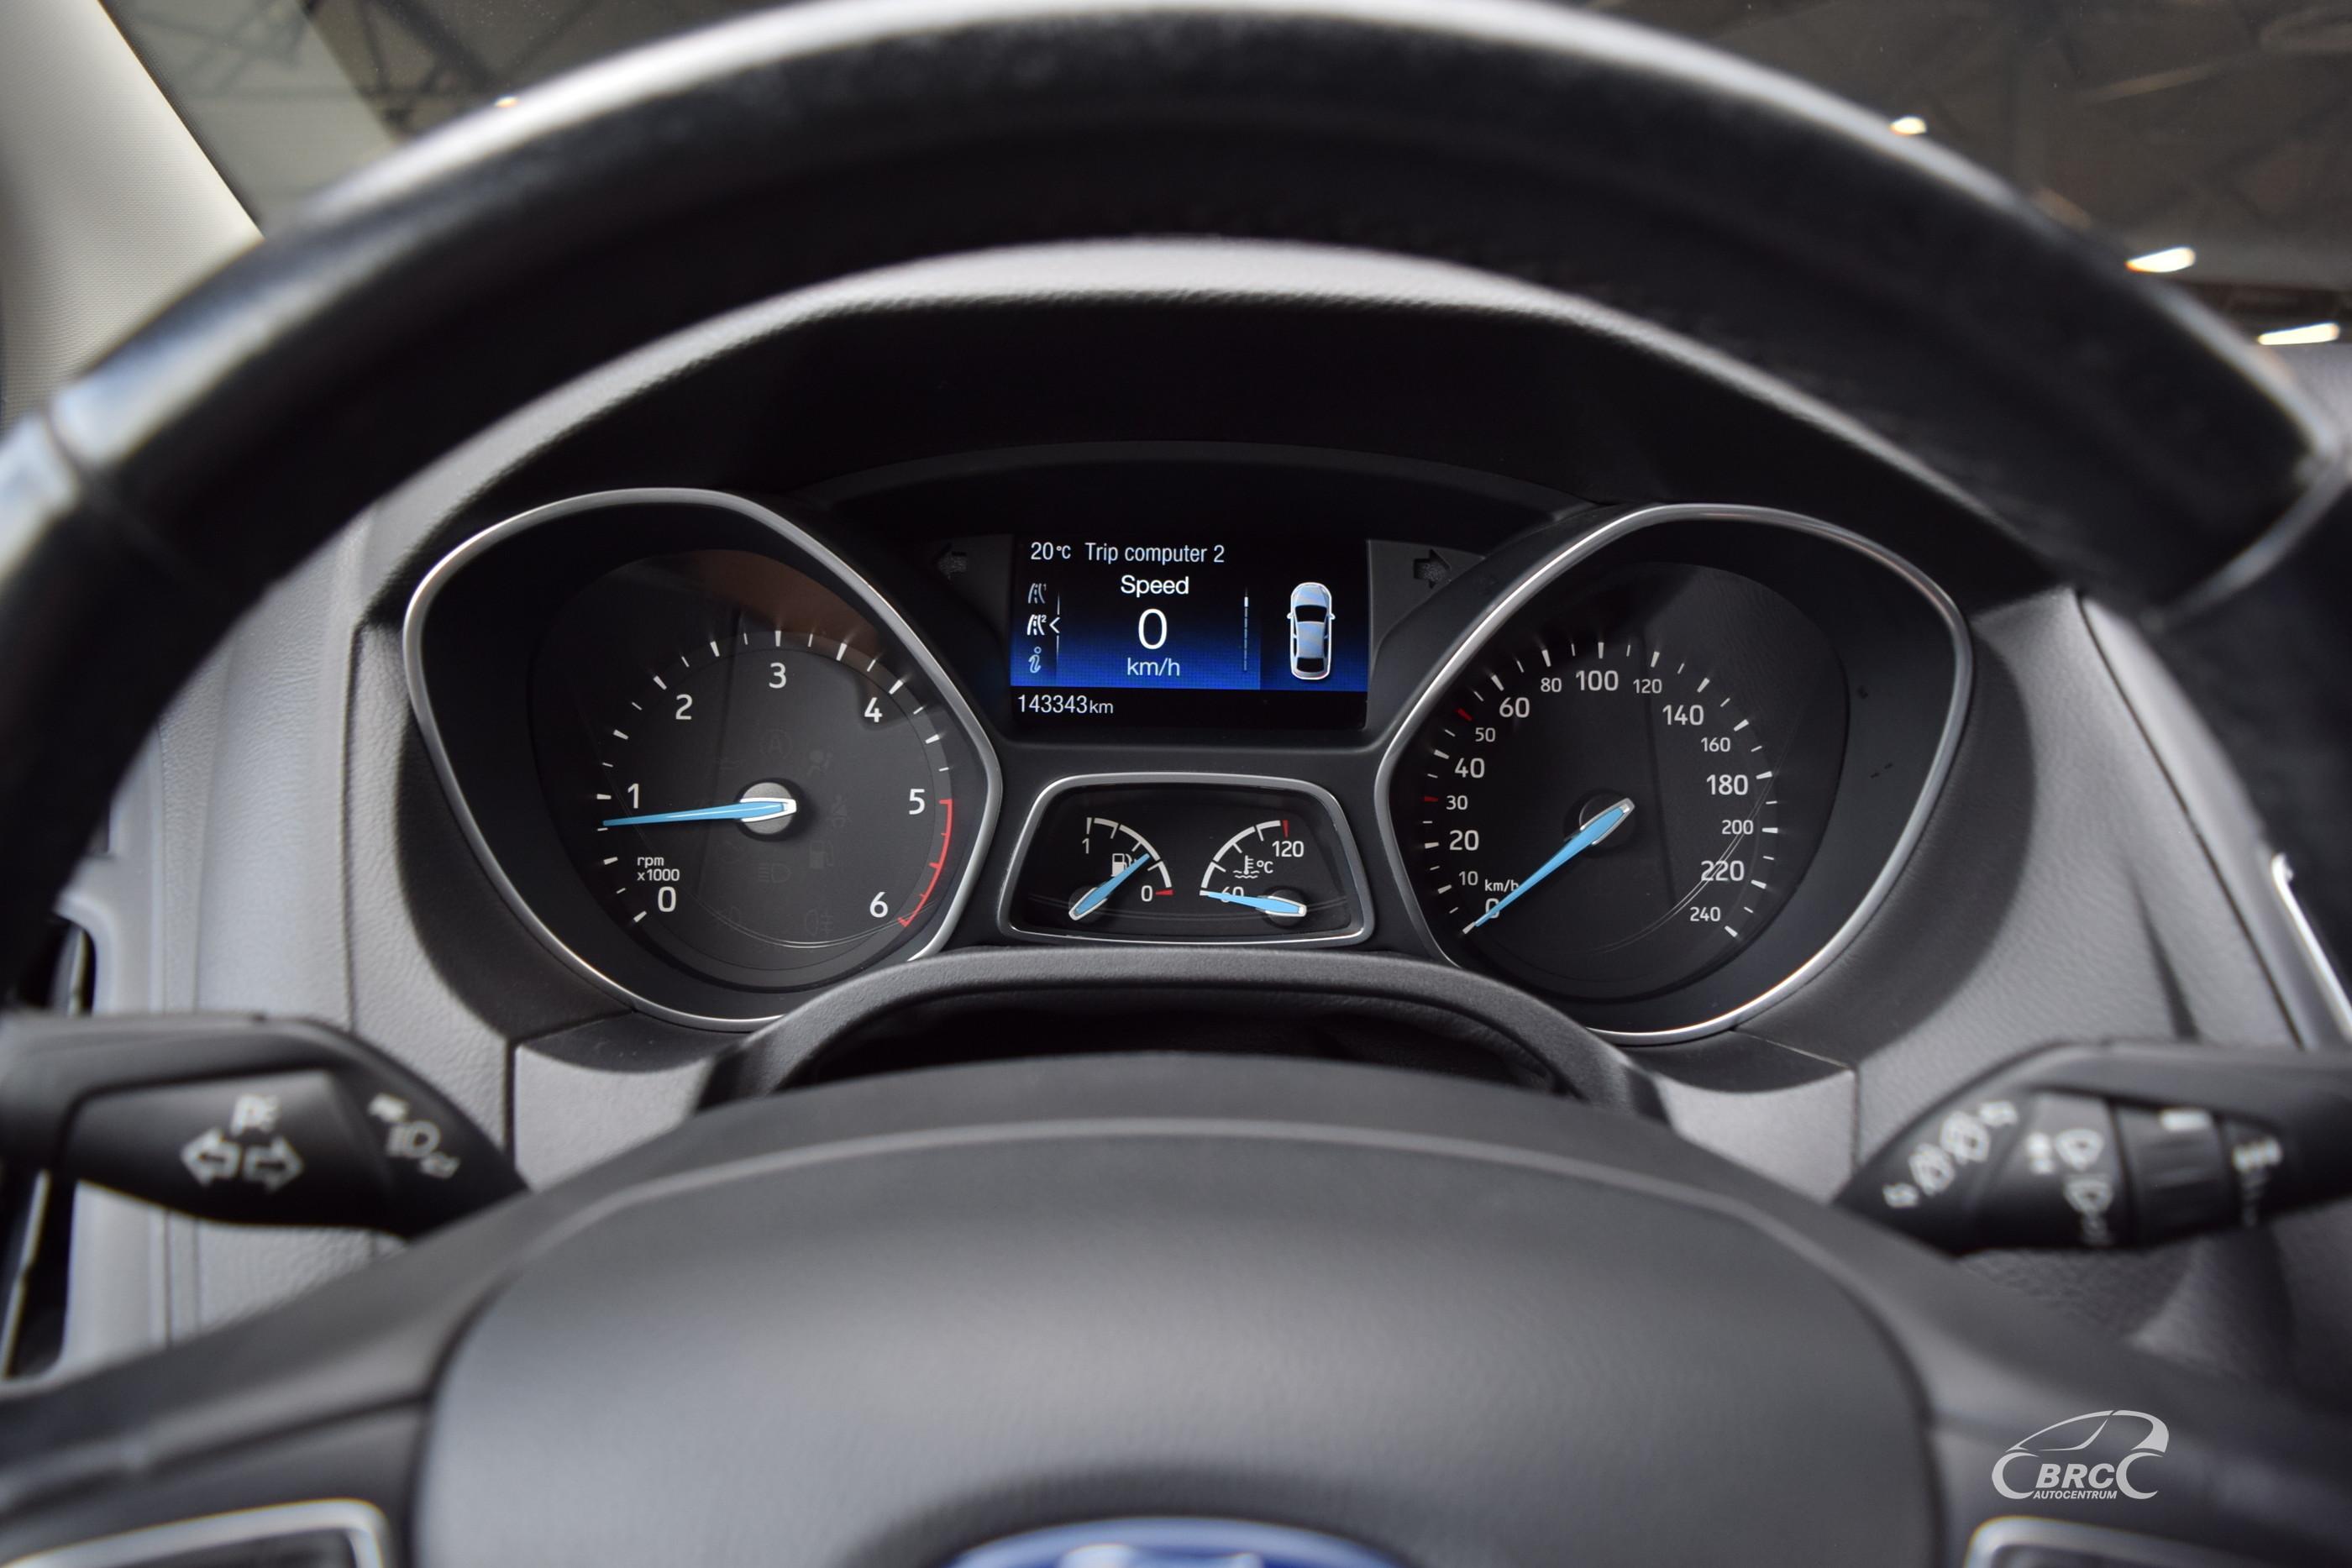 Ford Focus M/T